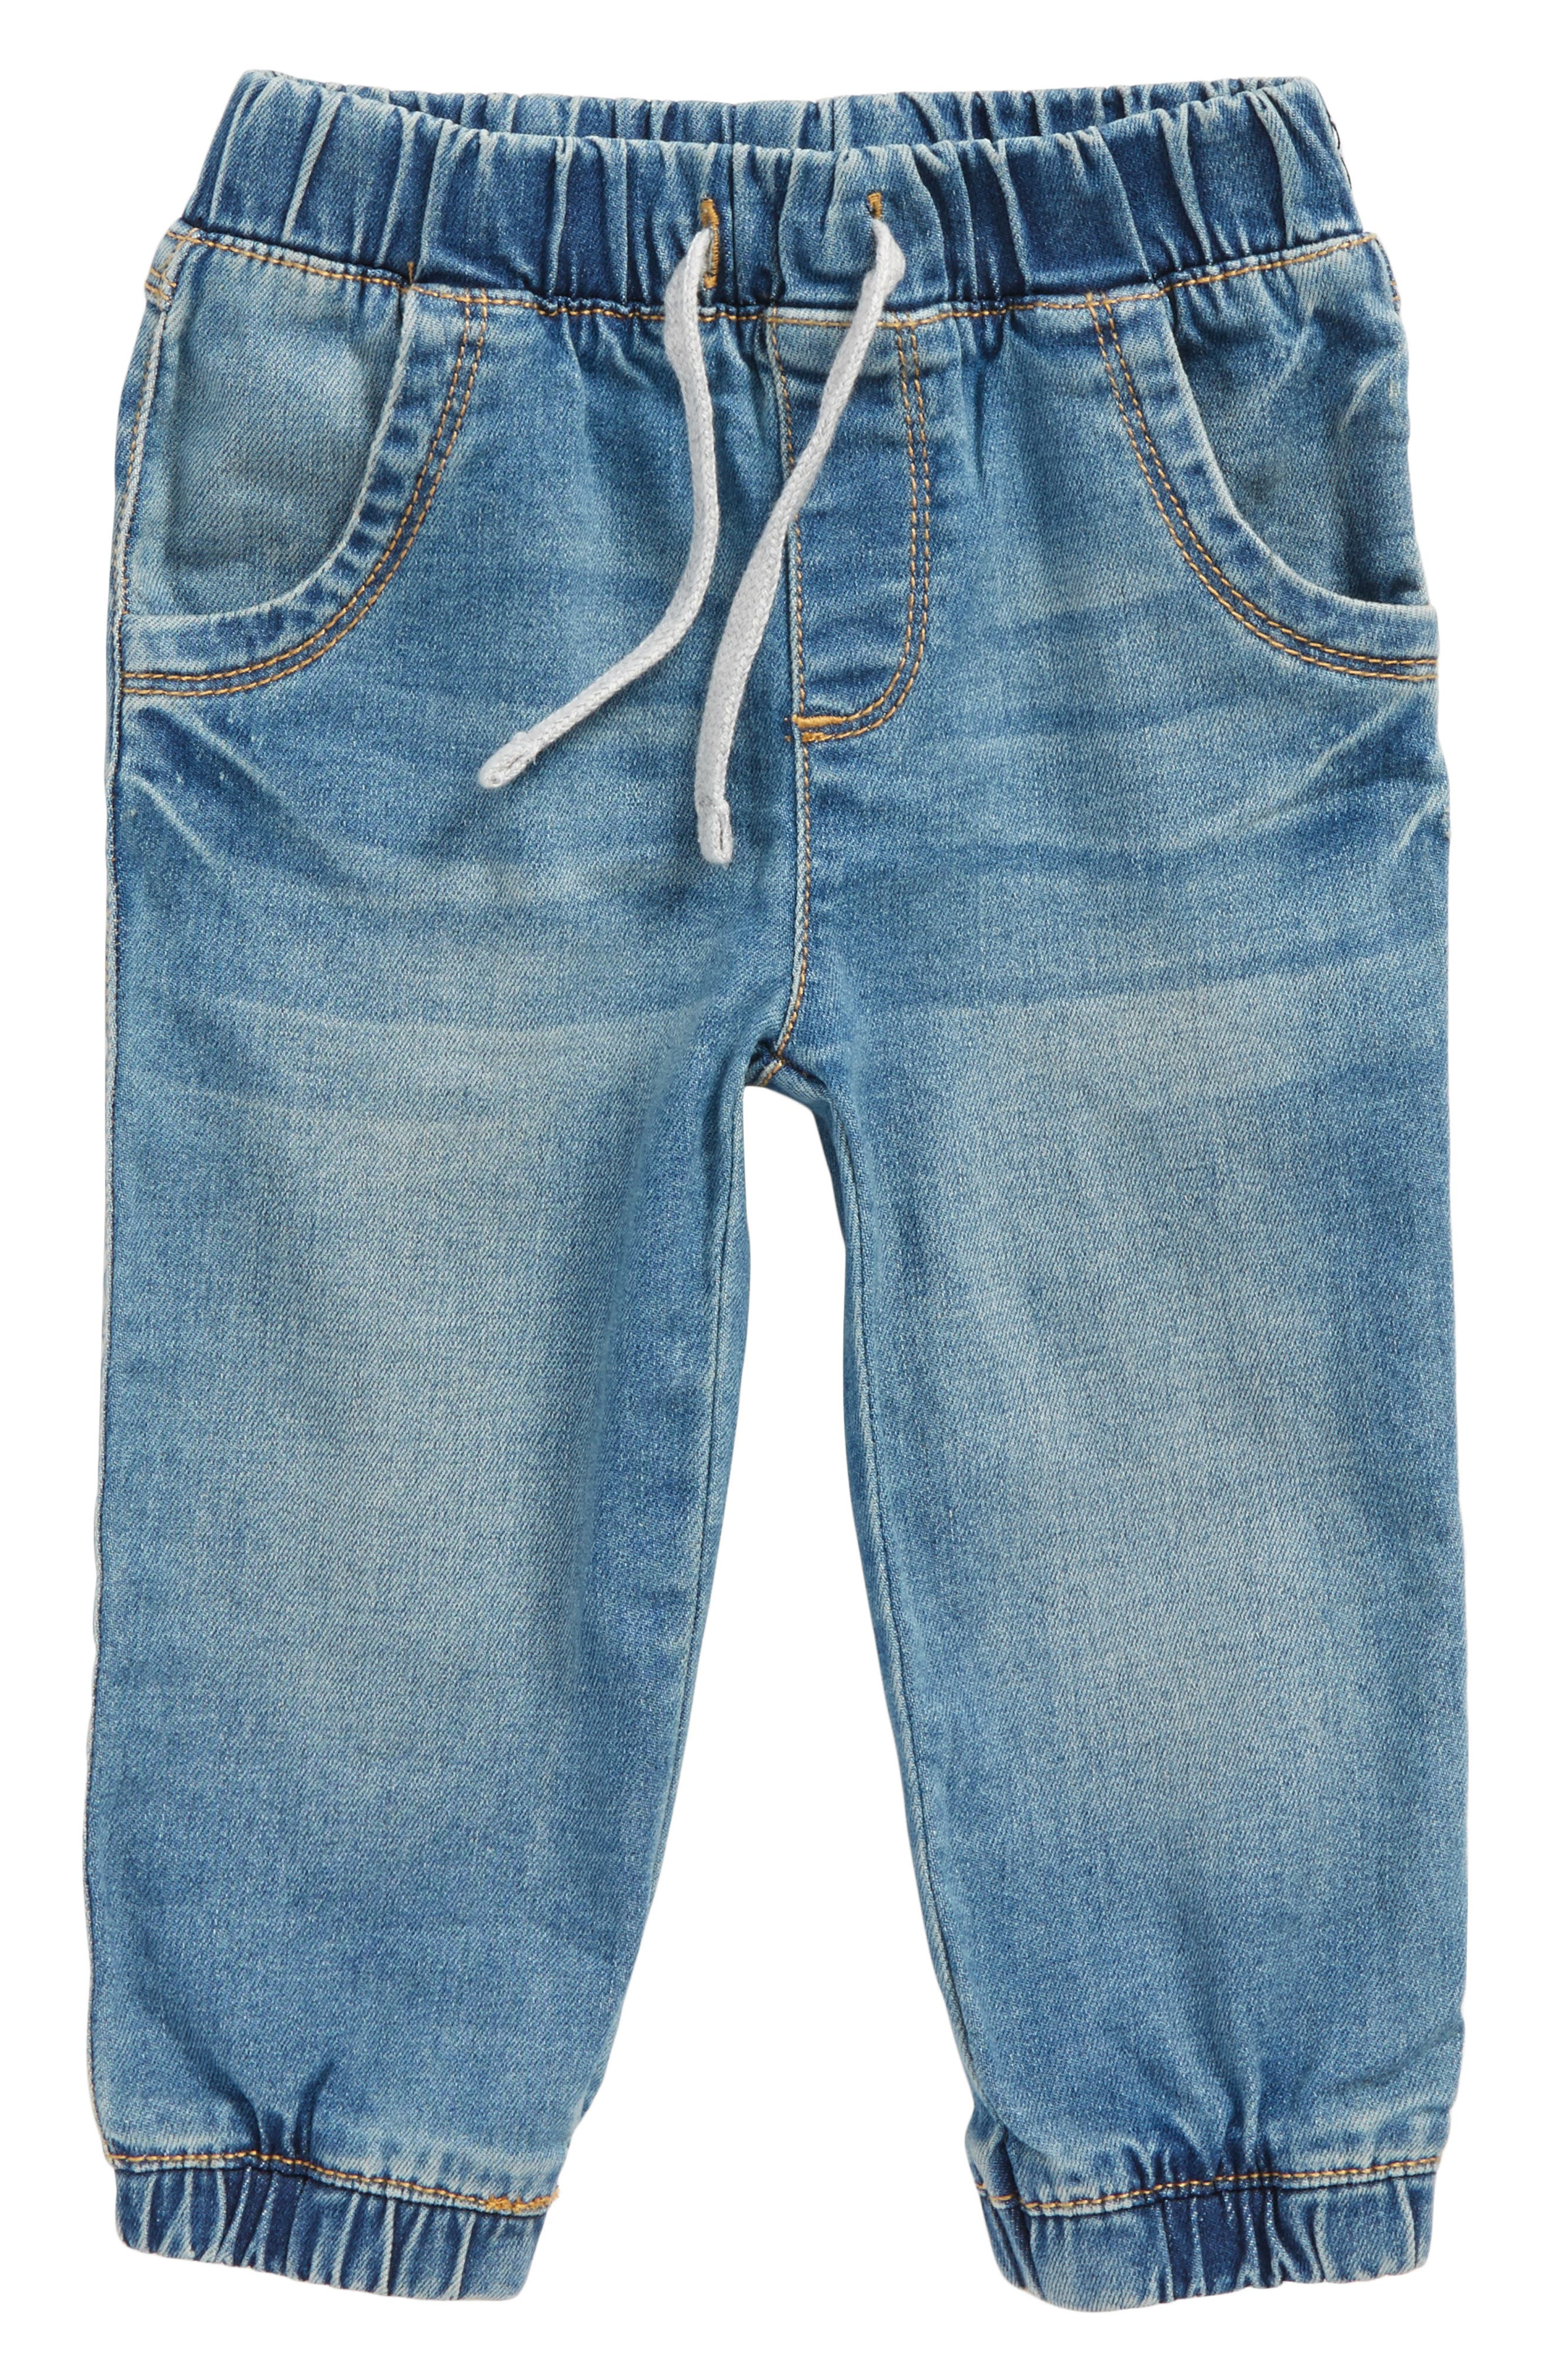 Main Image - Tucker + Tate Stretch Denim Jogger Pants (Baby Boys)